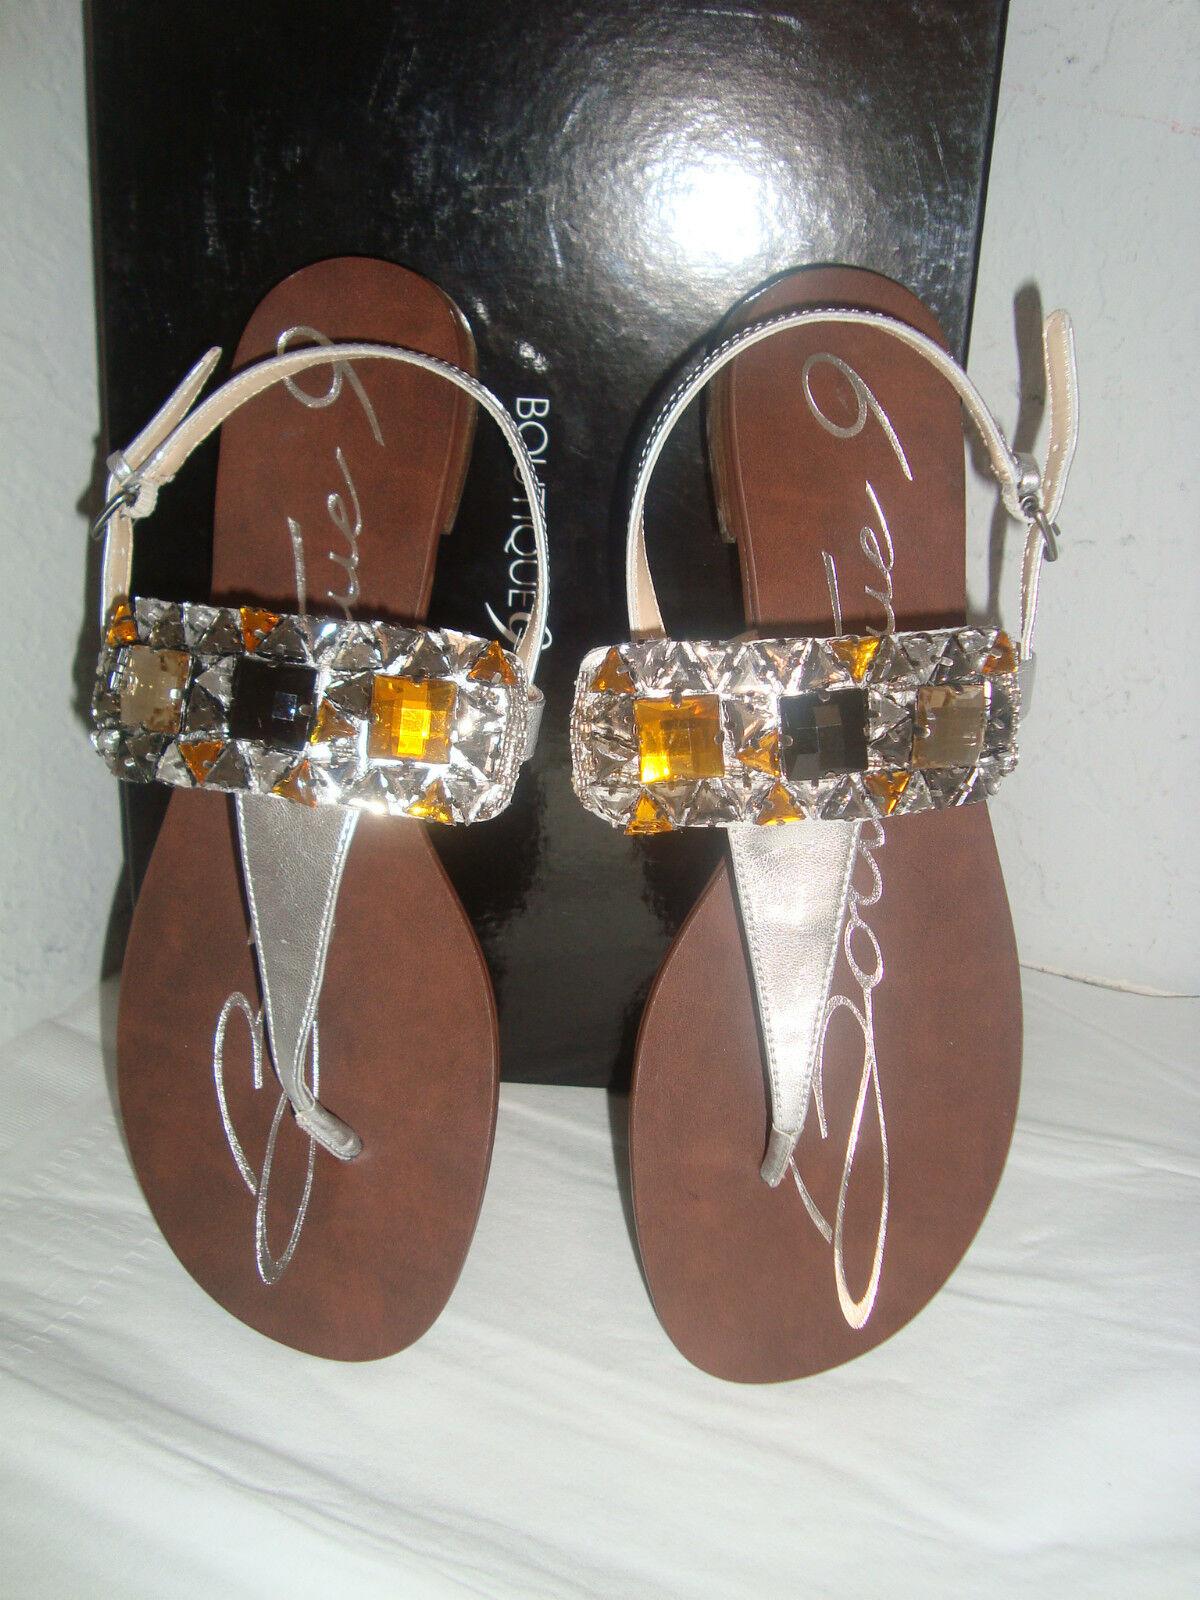 NEU Boutique 9 Perogative Silver Jeweled Thong Sandales 9 Medium